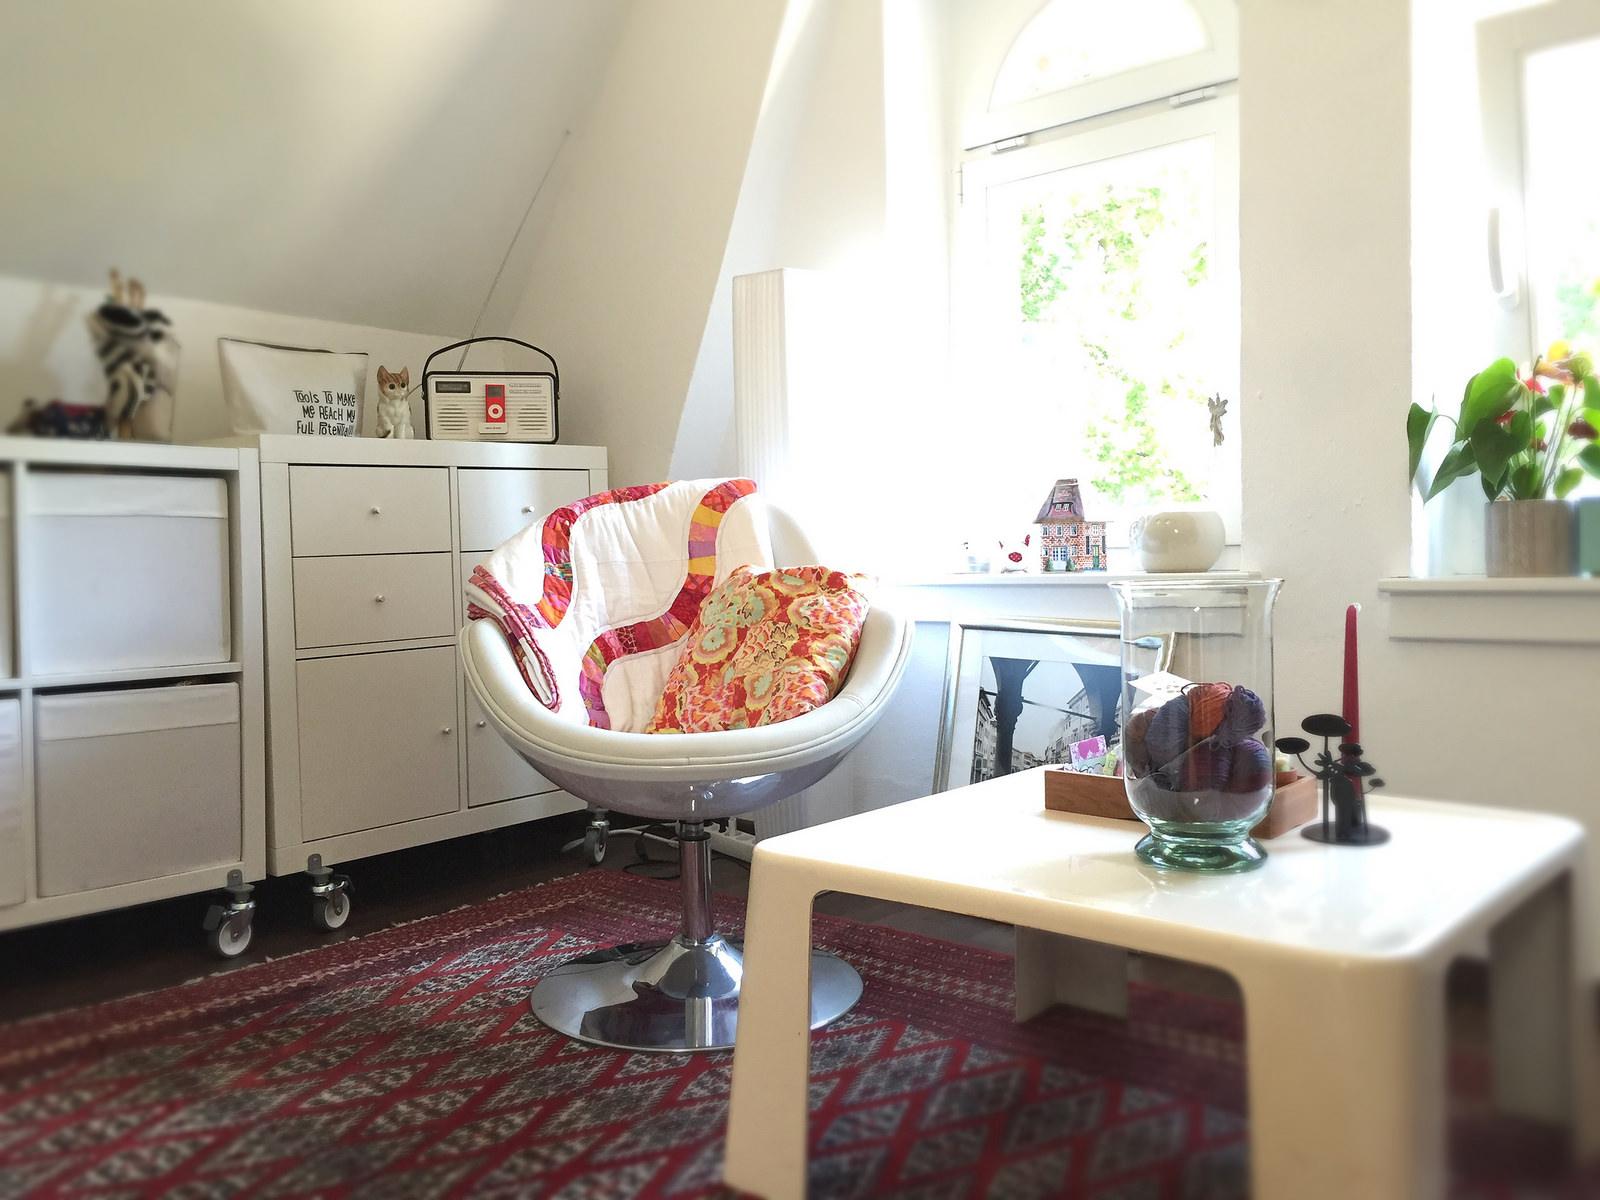 la wollbindung 08 2015. Black Bedroom Furniture Sets. Home Design Ideas